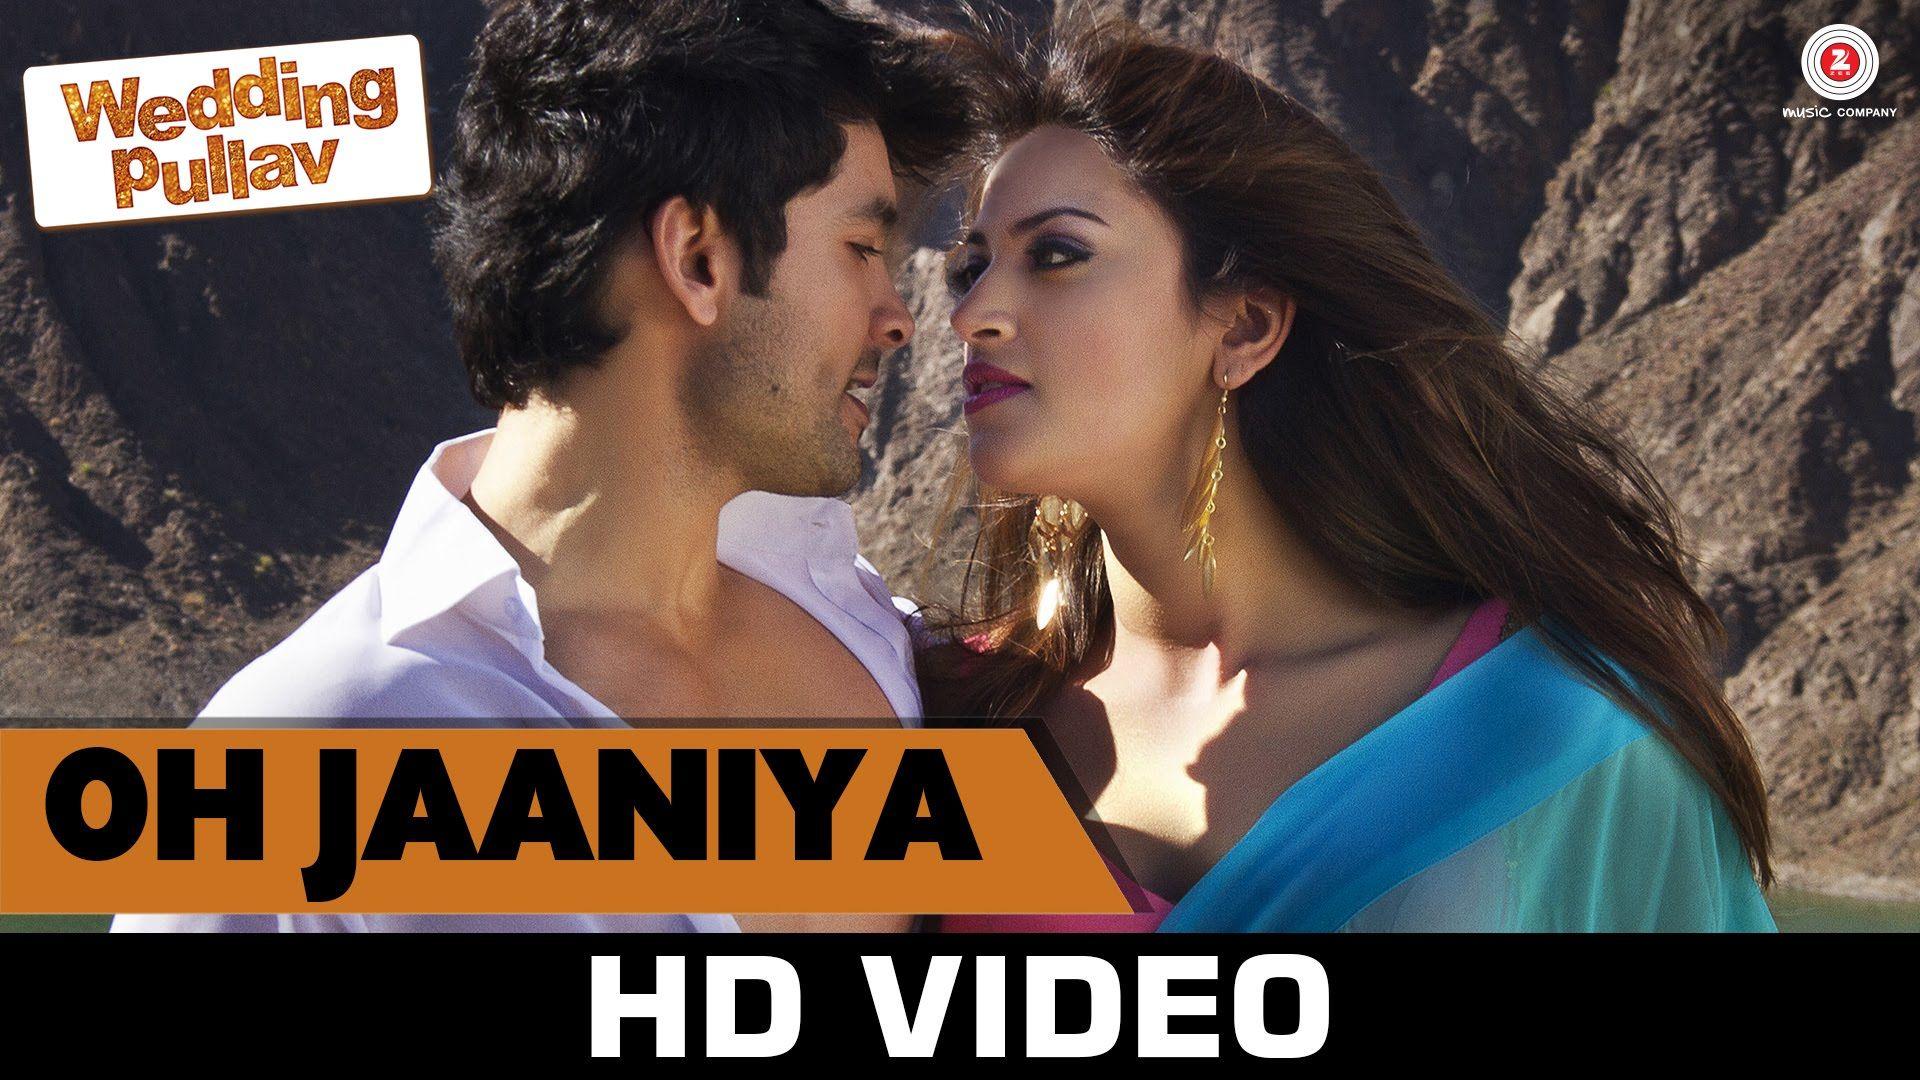 Oh Jaaniya Wedding Pullav Salim Merchant Shreya Ghoshal Raj Pandit Bollywood Movie Songs Latest Bollywood Songs Bollywood Movie